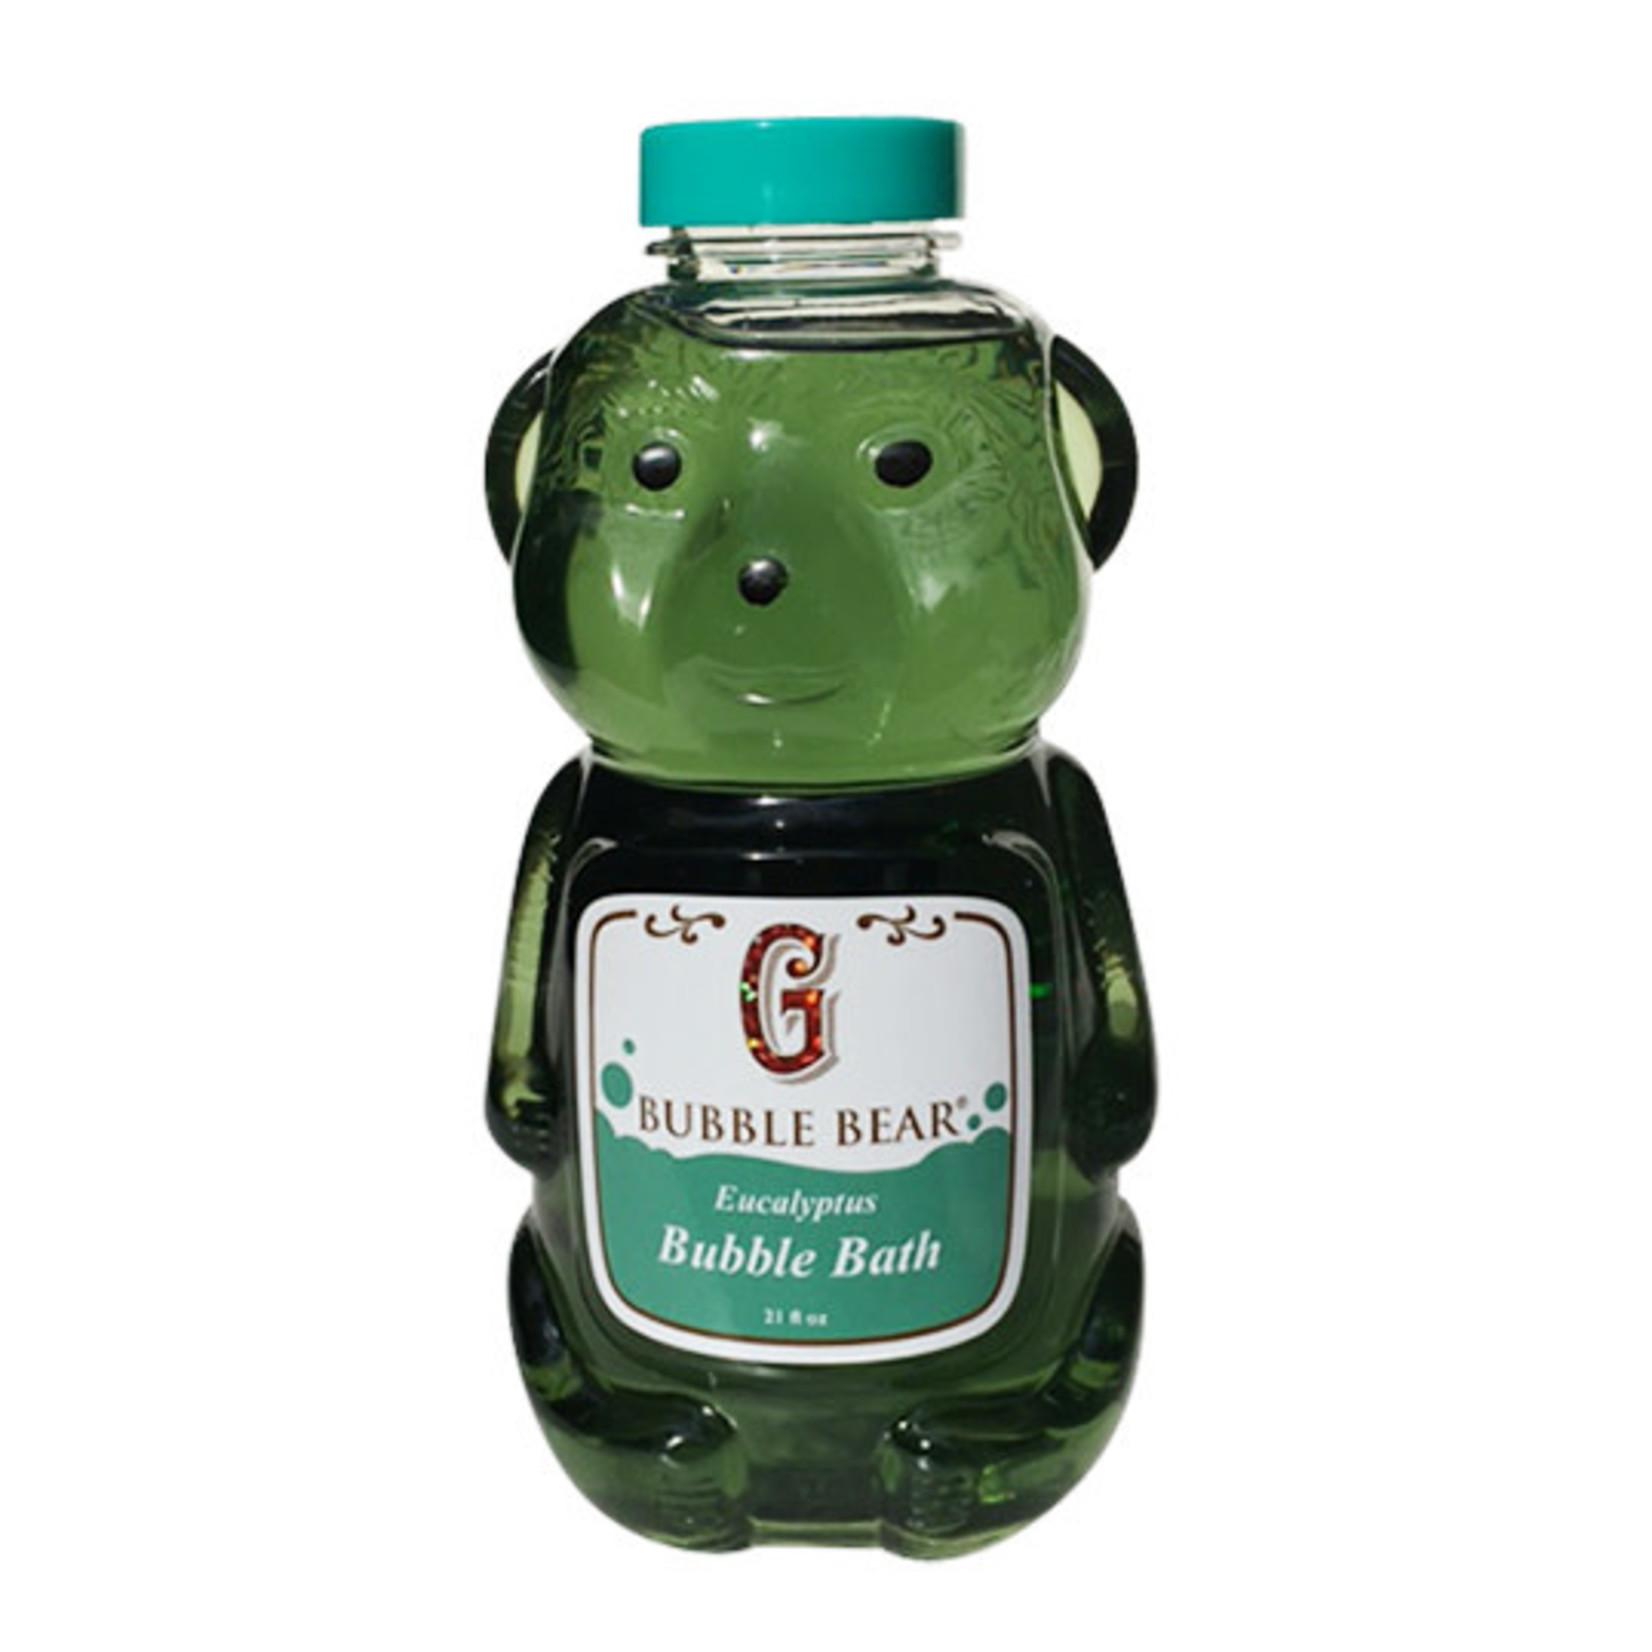 GRIFFIN REMEDY Griffin Remedy Bubble Bear Bubble Bath Eucalyptus